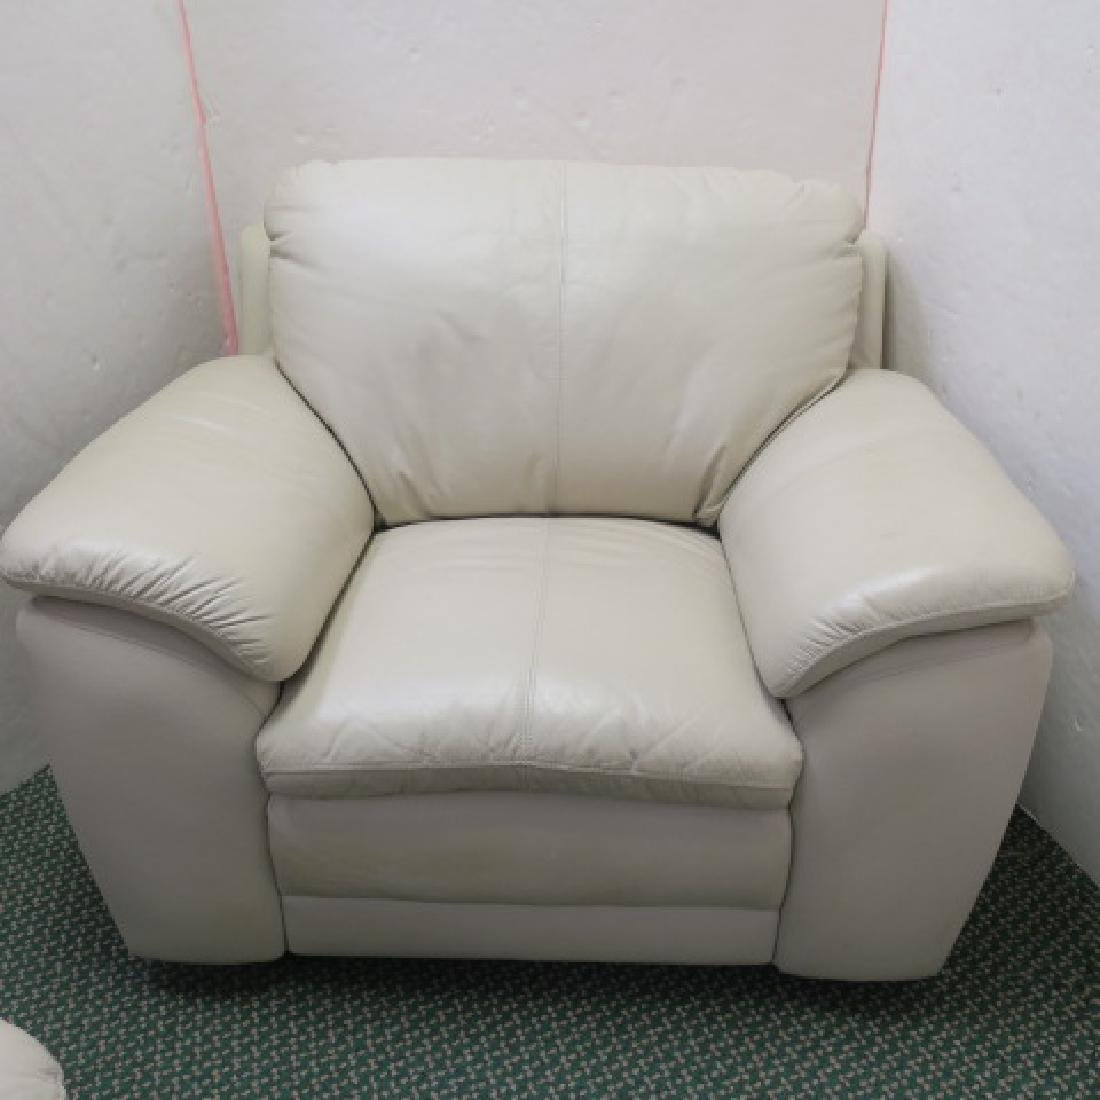 Cream Overstuffed Single Cushion Leather Chair: